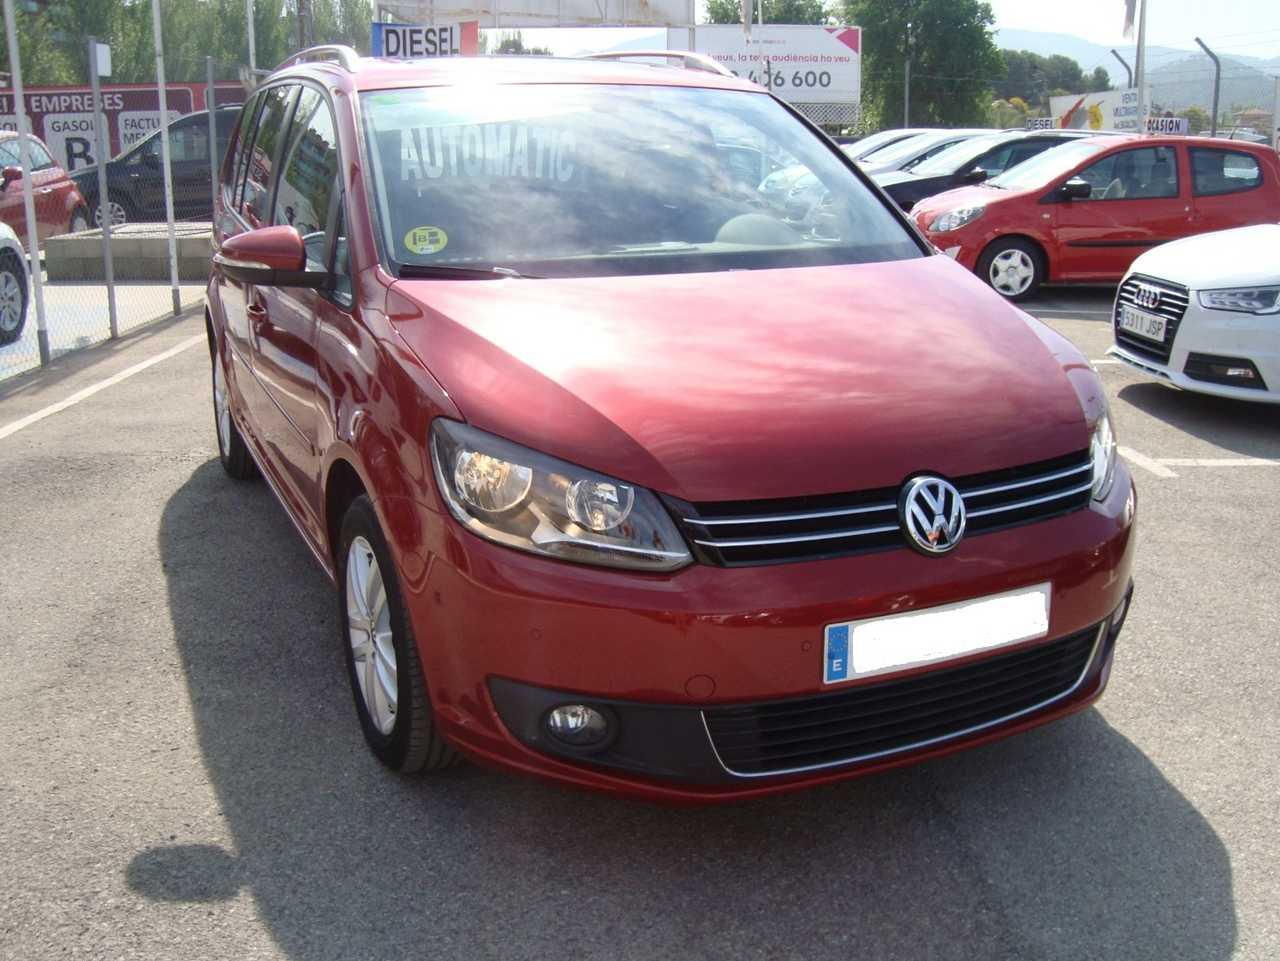 Volkswagen Touran 1.6 TDI 105 CV DSG 7 PLAZAS   - Foto 1